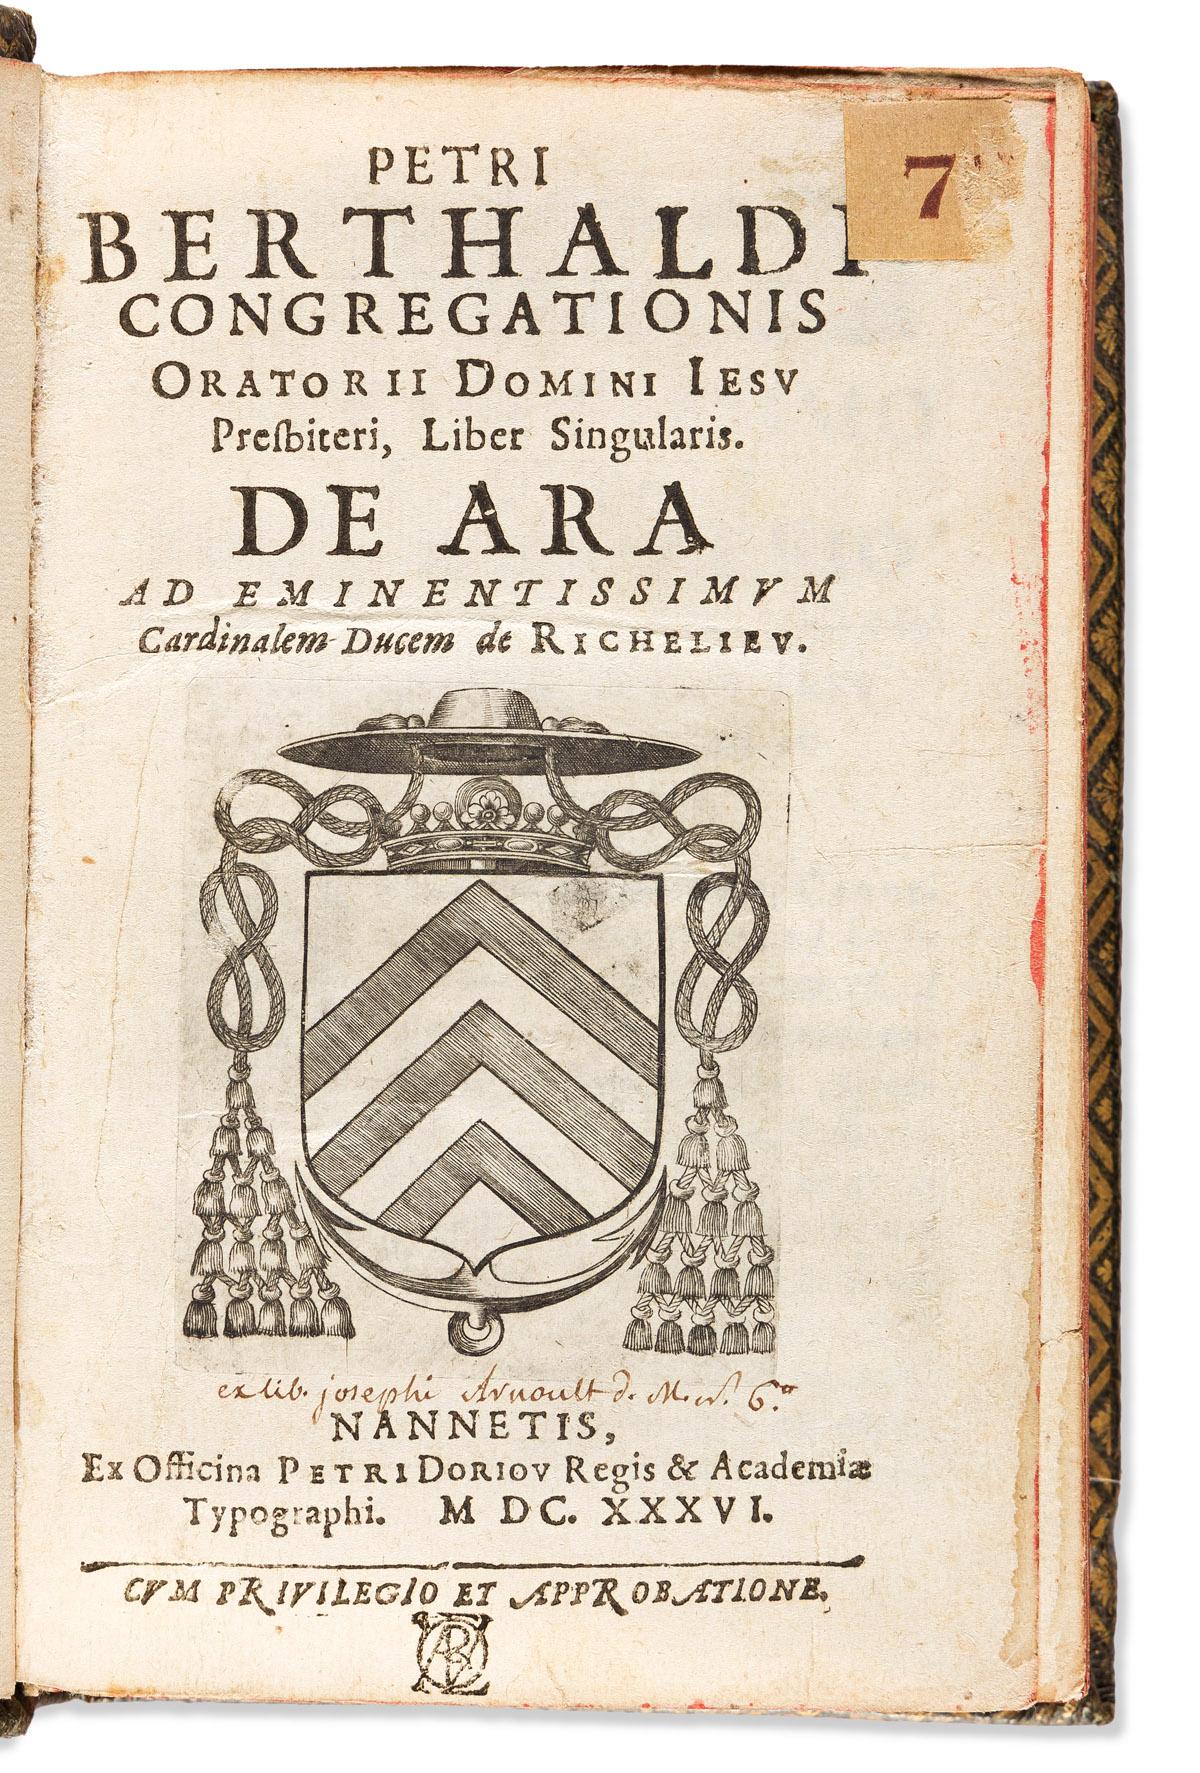 Berthault, Pierre (1600-1681) Liber Singularis de Ara.